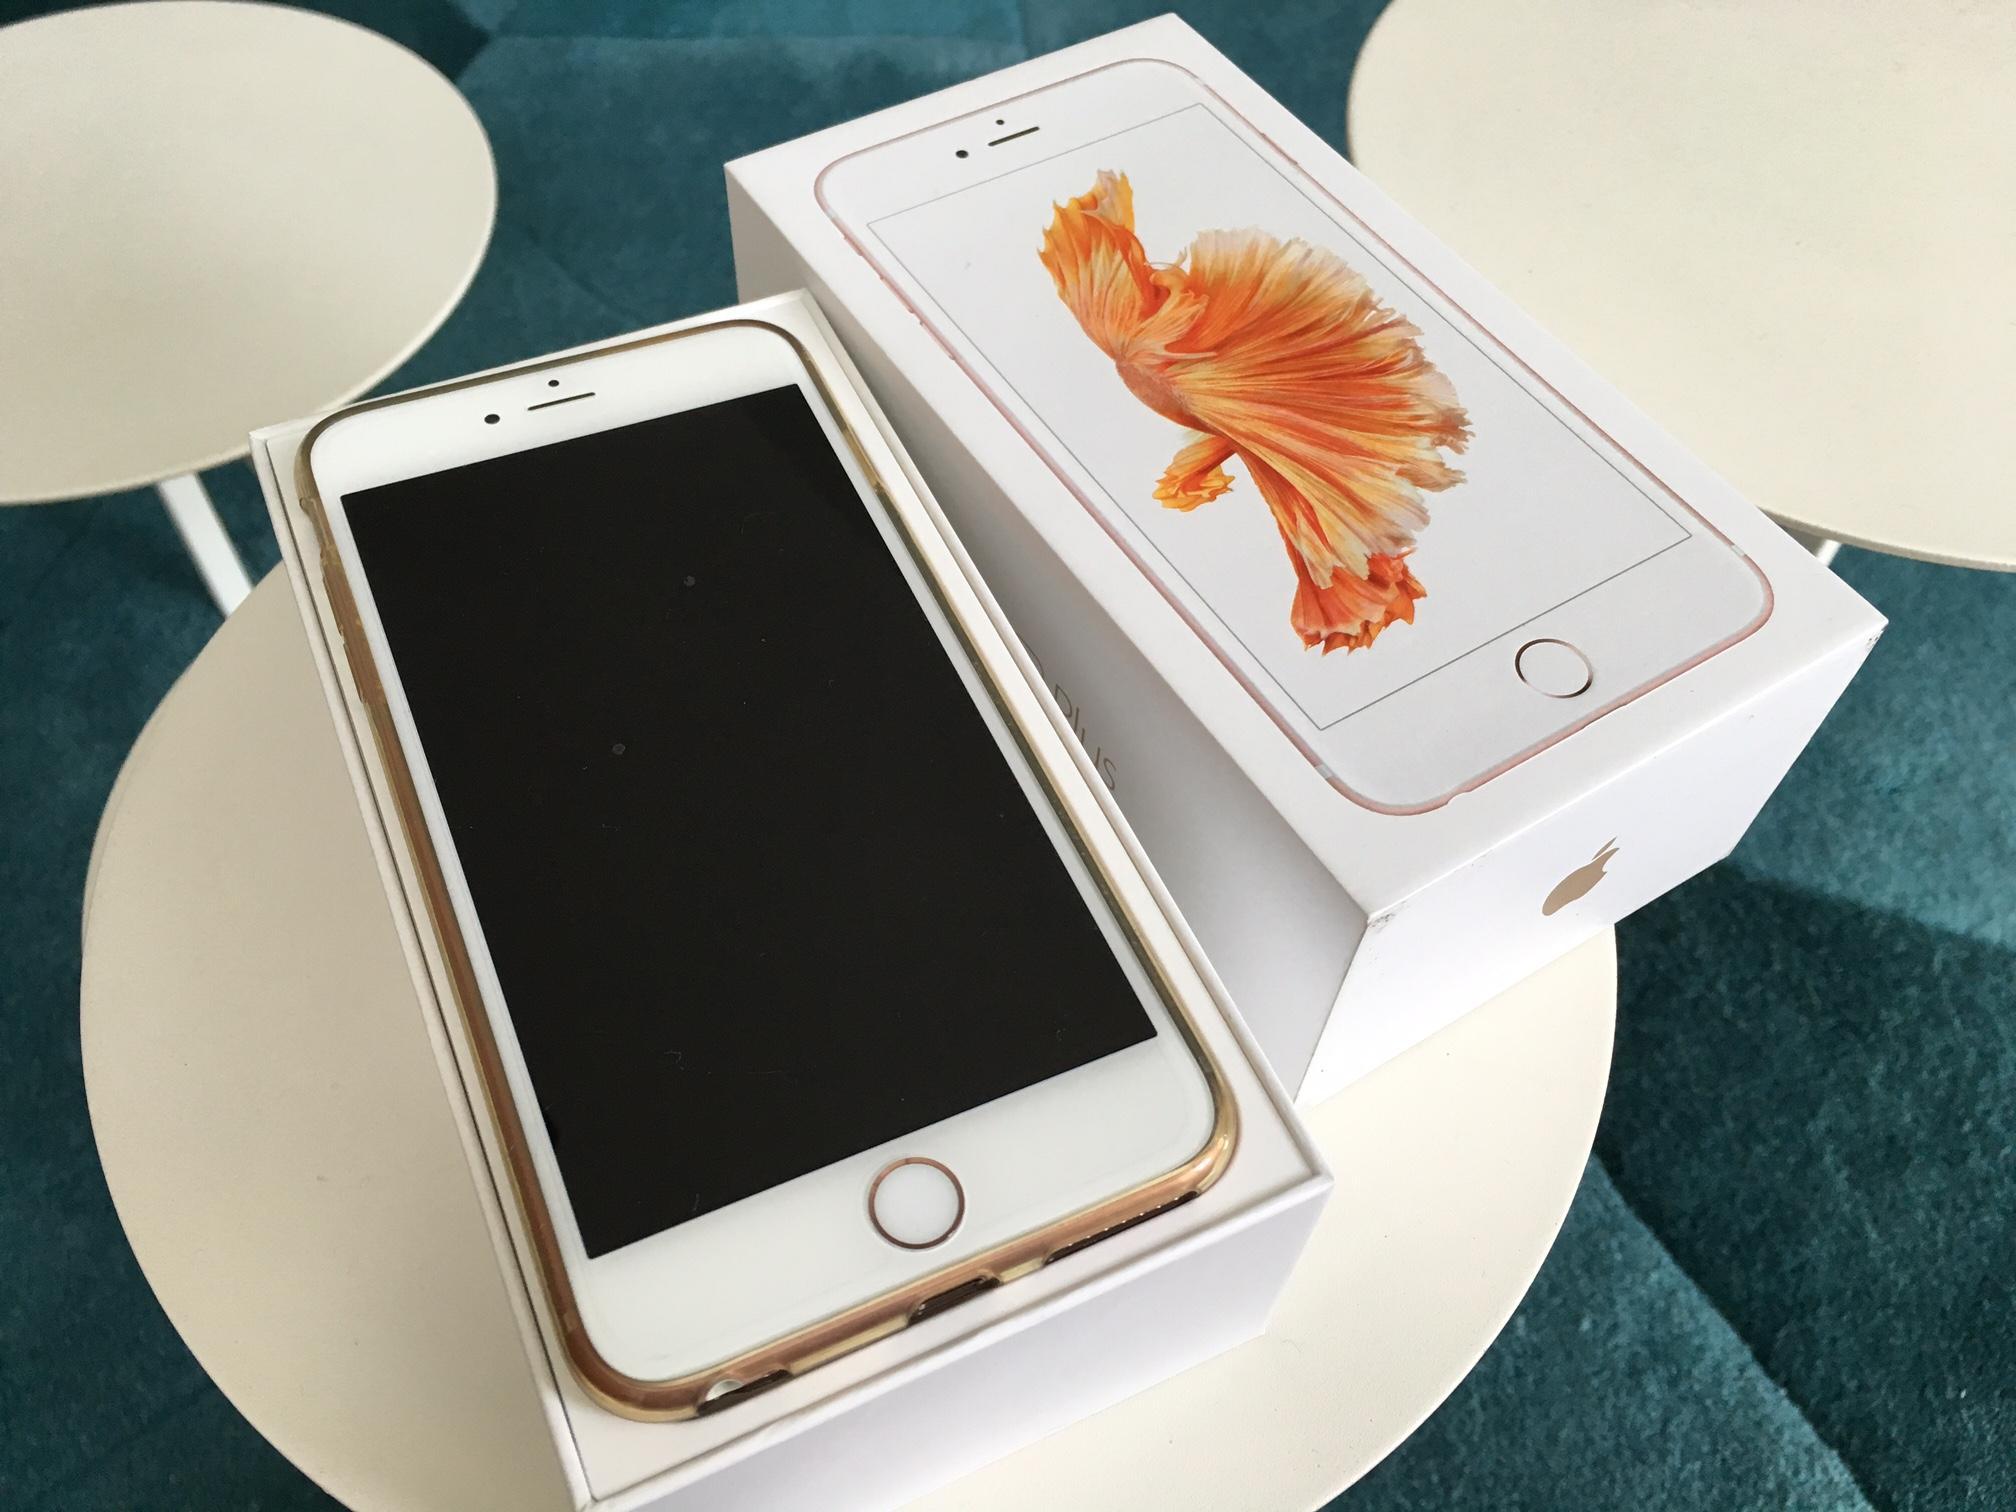 iphone 6s plus rose gold 16gb. Black Bedroom Furniture Sets. Home Design Ideas